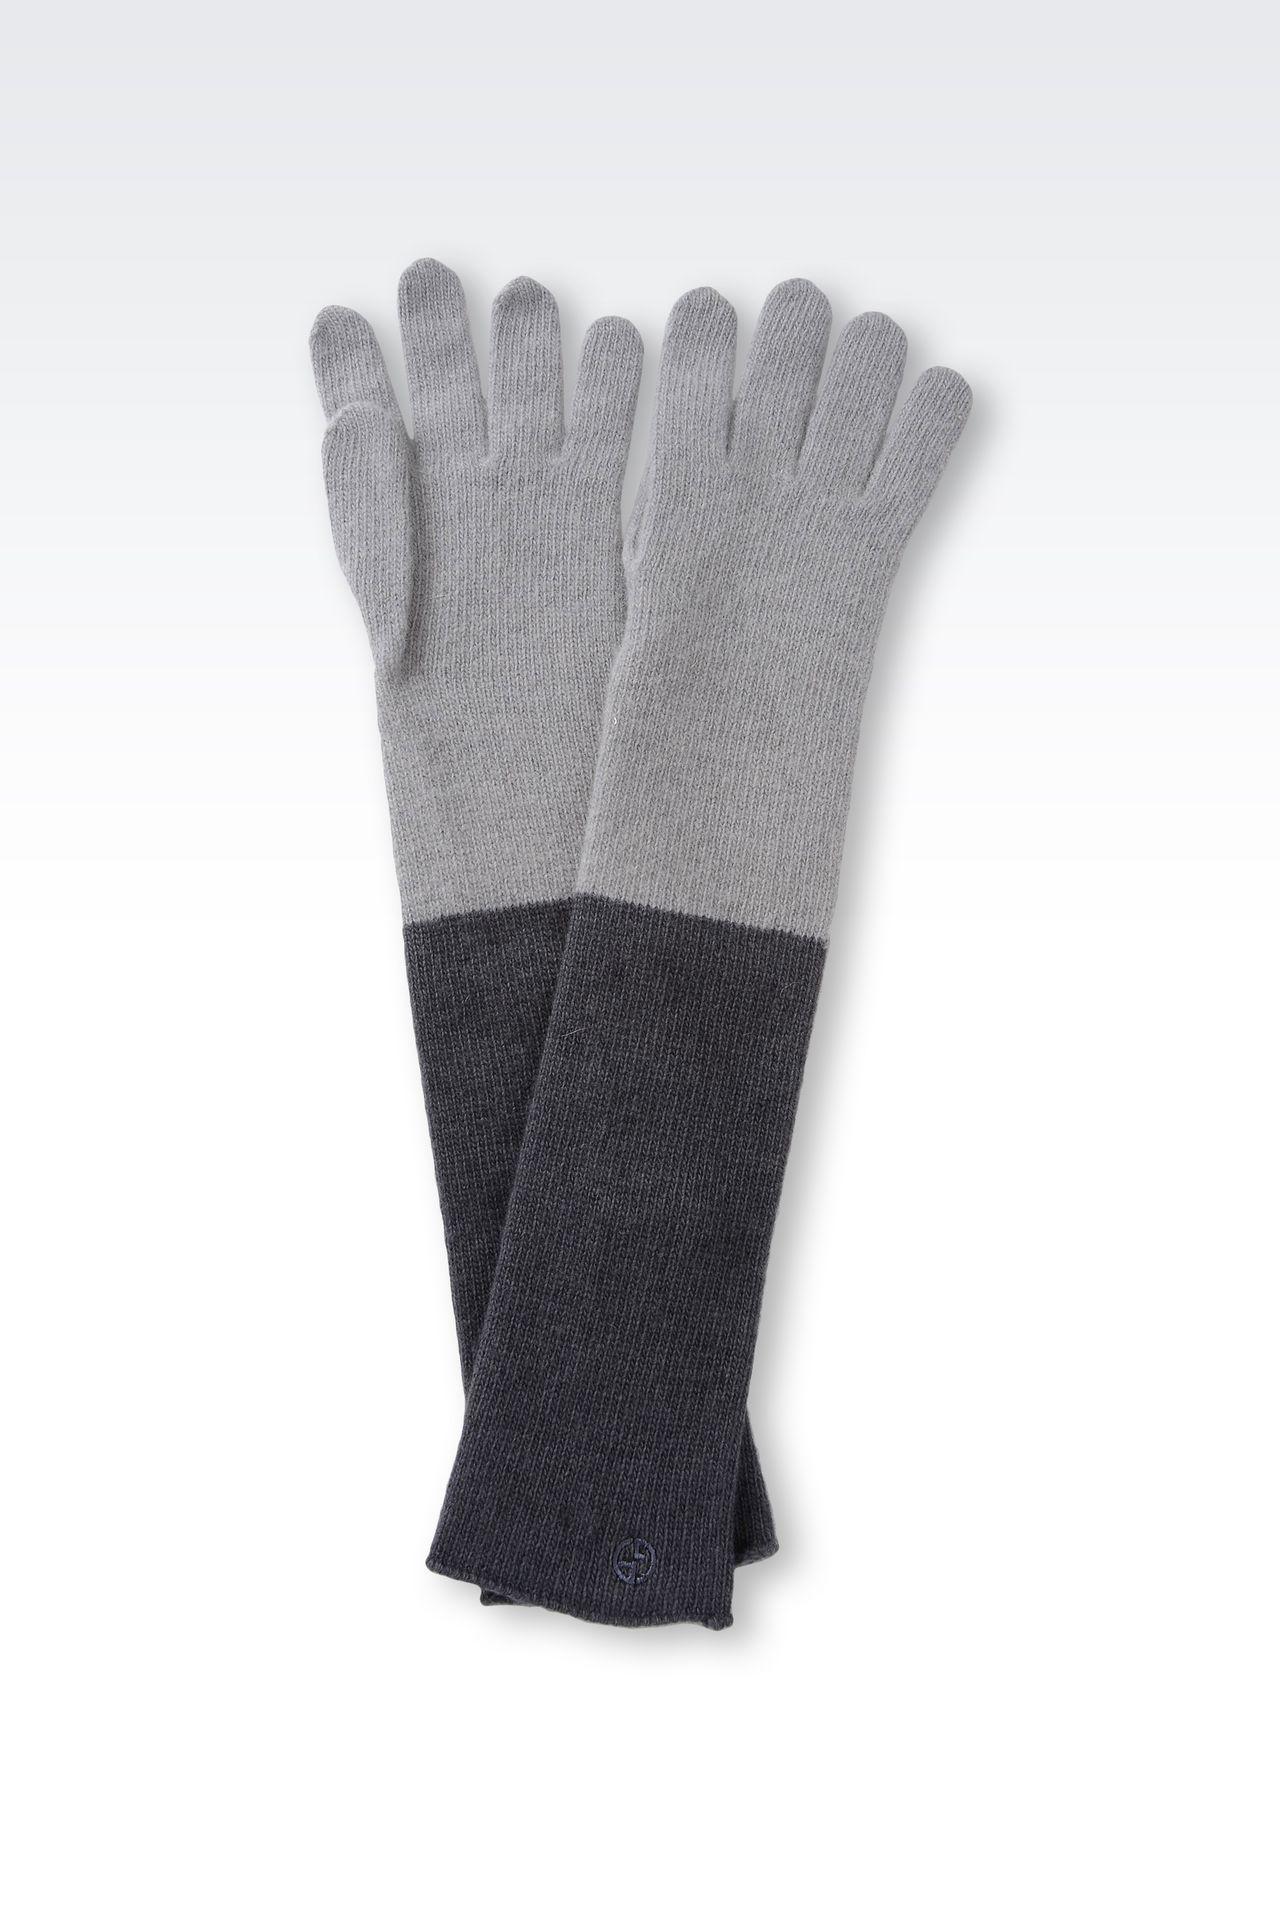 Knitting Pattern Long Gloves : Giorgio Armani Women LONG KNIT GLOVE - Armani.com